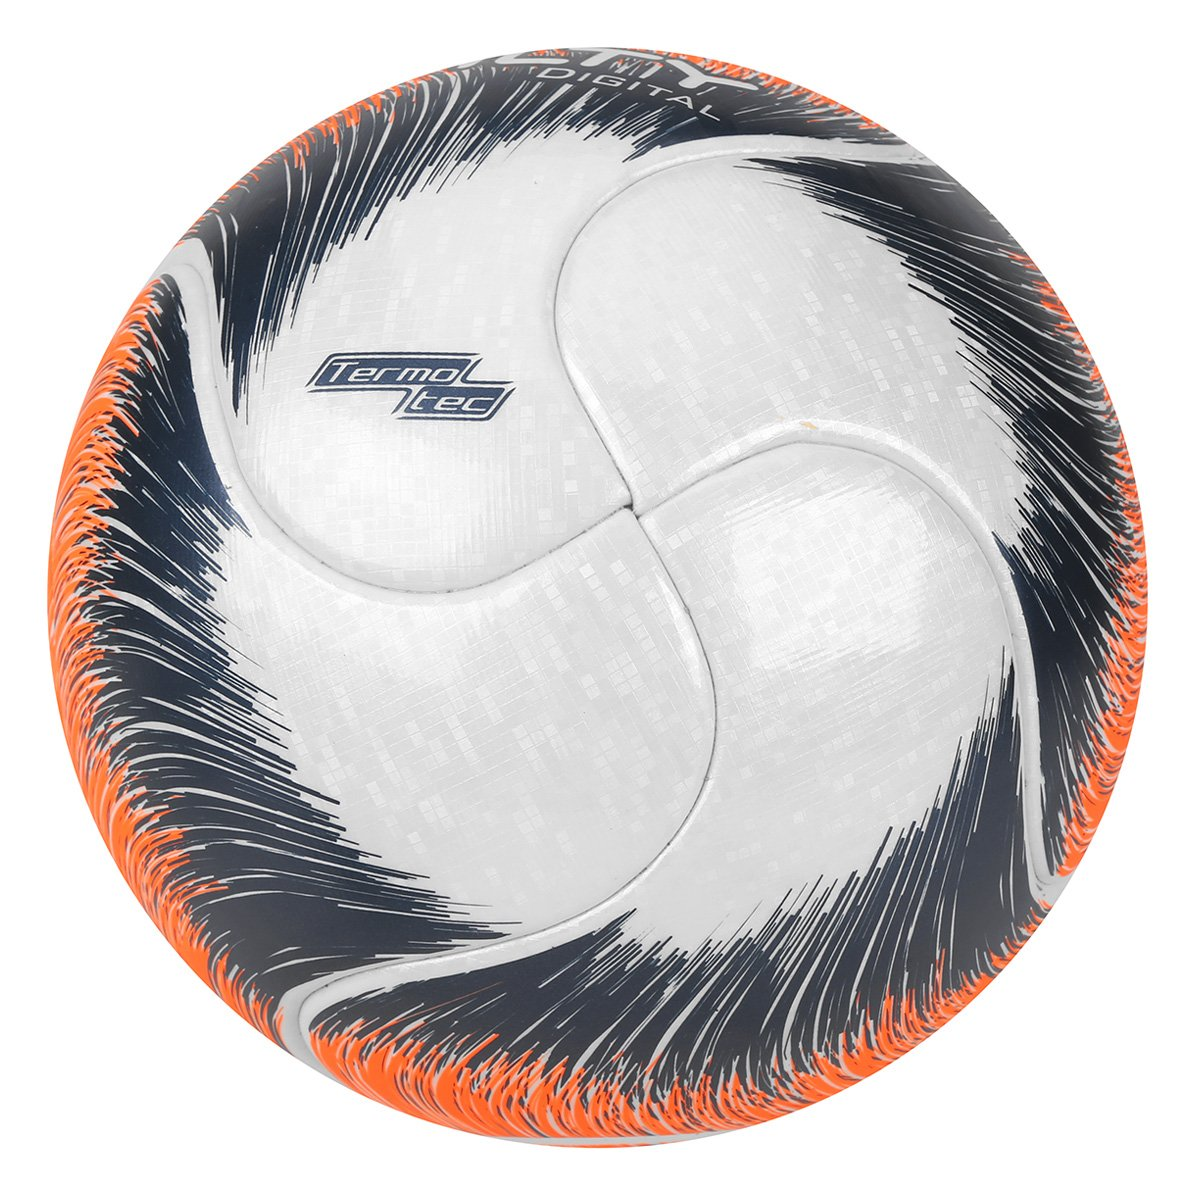 85d29cdb4a Bola Futsal Penalty Digital 500 Termotec VIII - Branco e Laranja ...